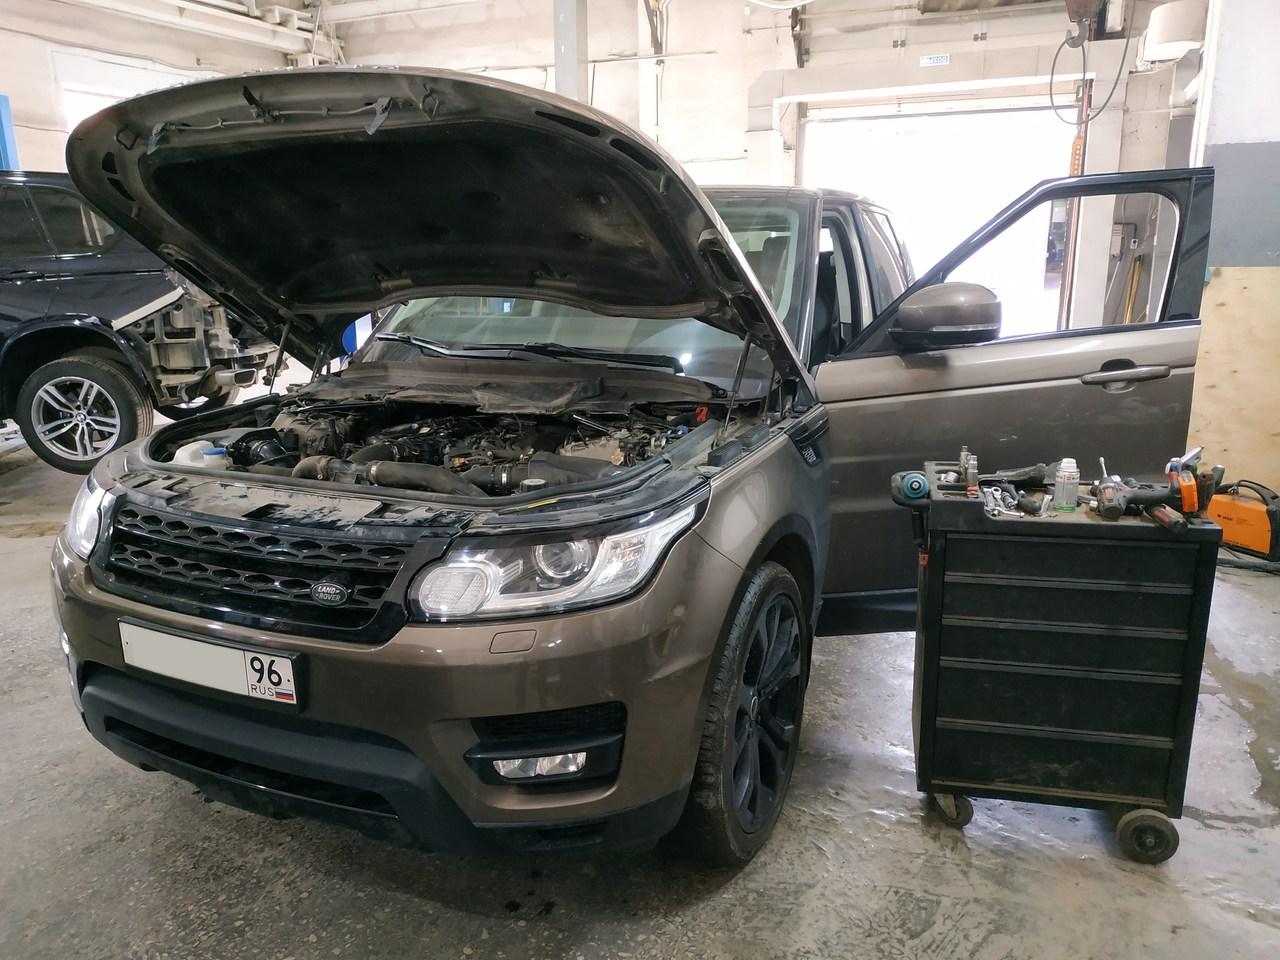 Range Rover Sport, отключение EGR